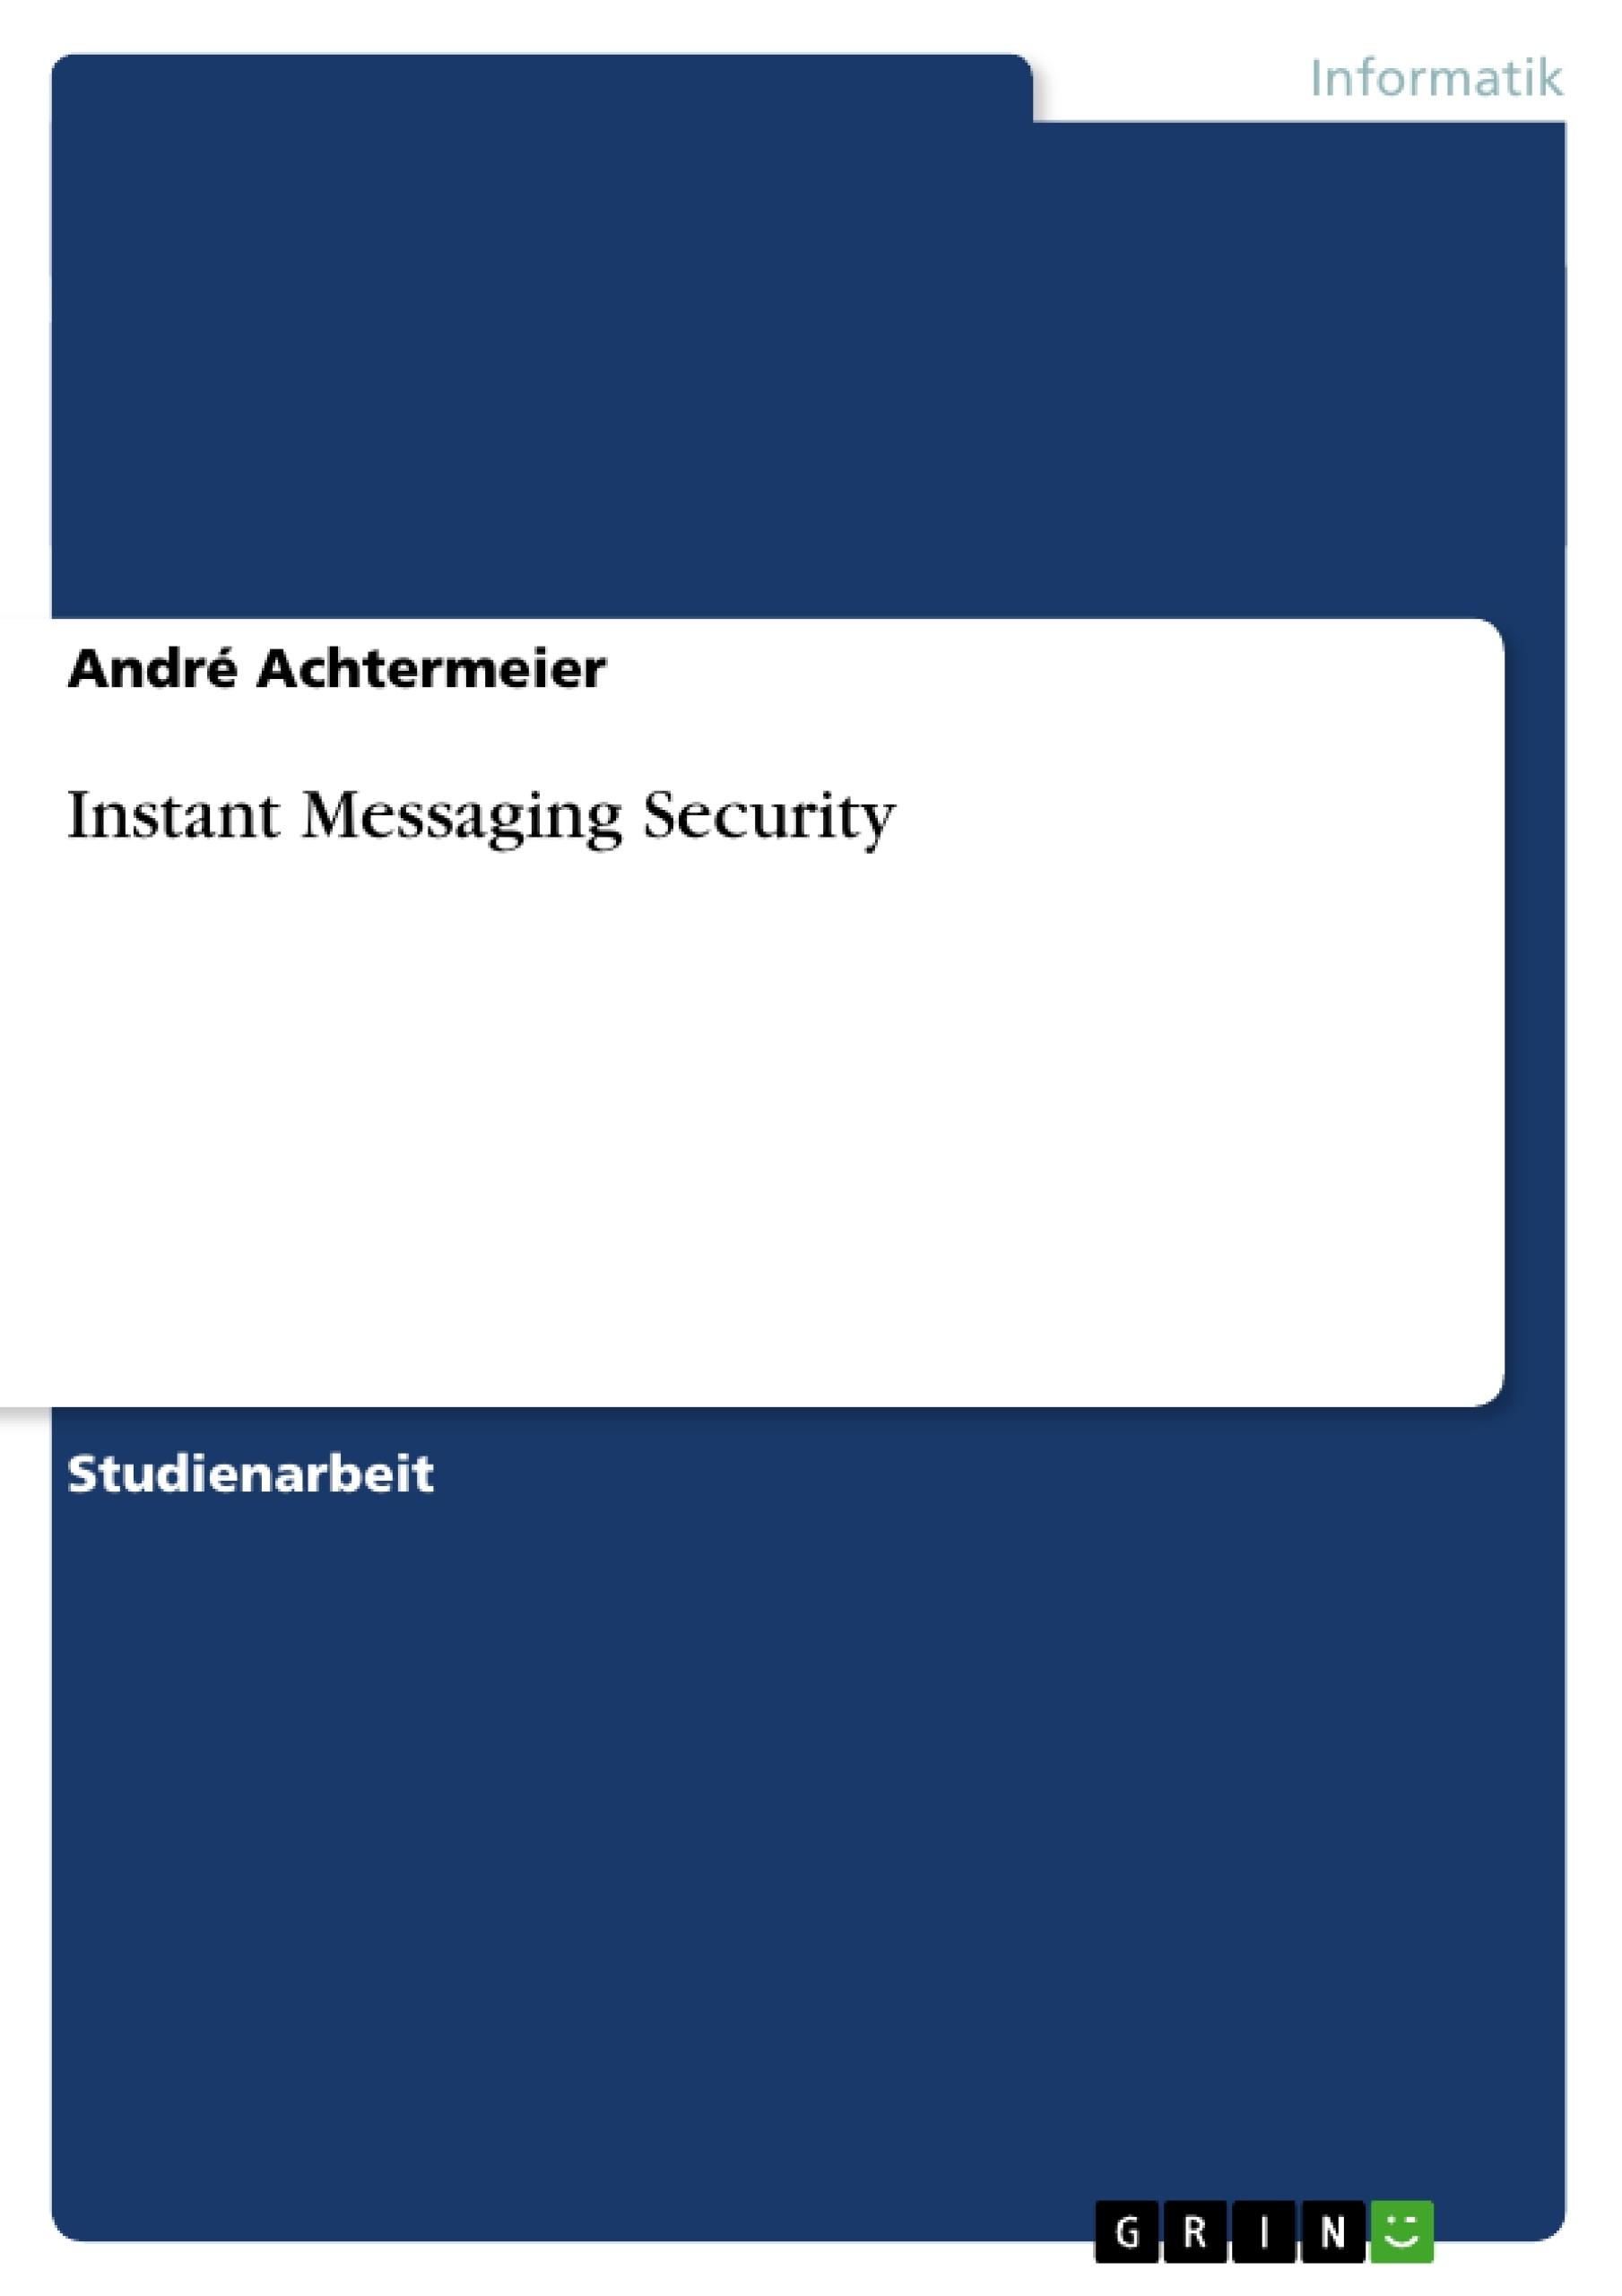 Titel: Instant Messaging Security